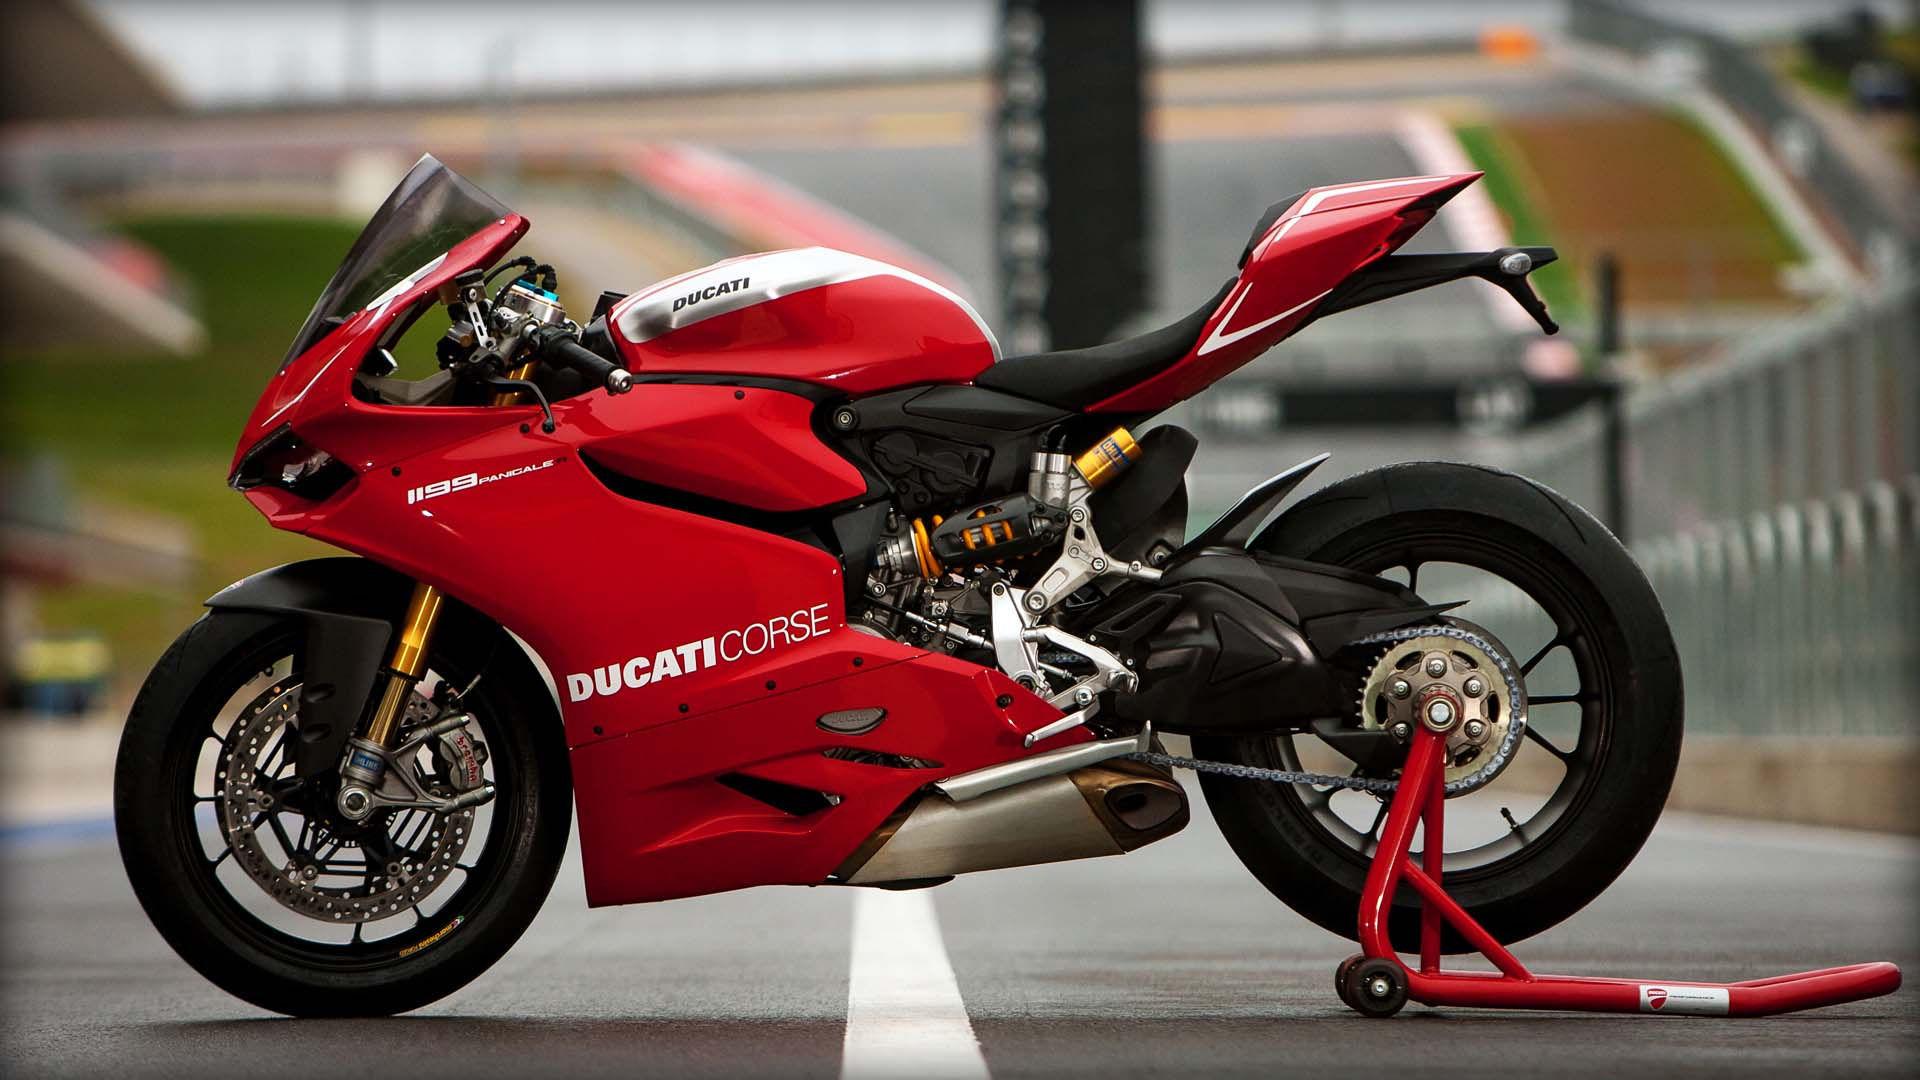 2014 Ducati  | Ducati 1199 Panigale R - Sitting